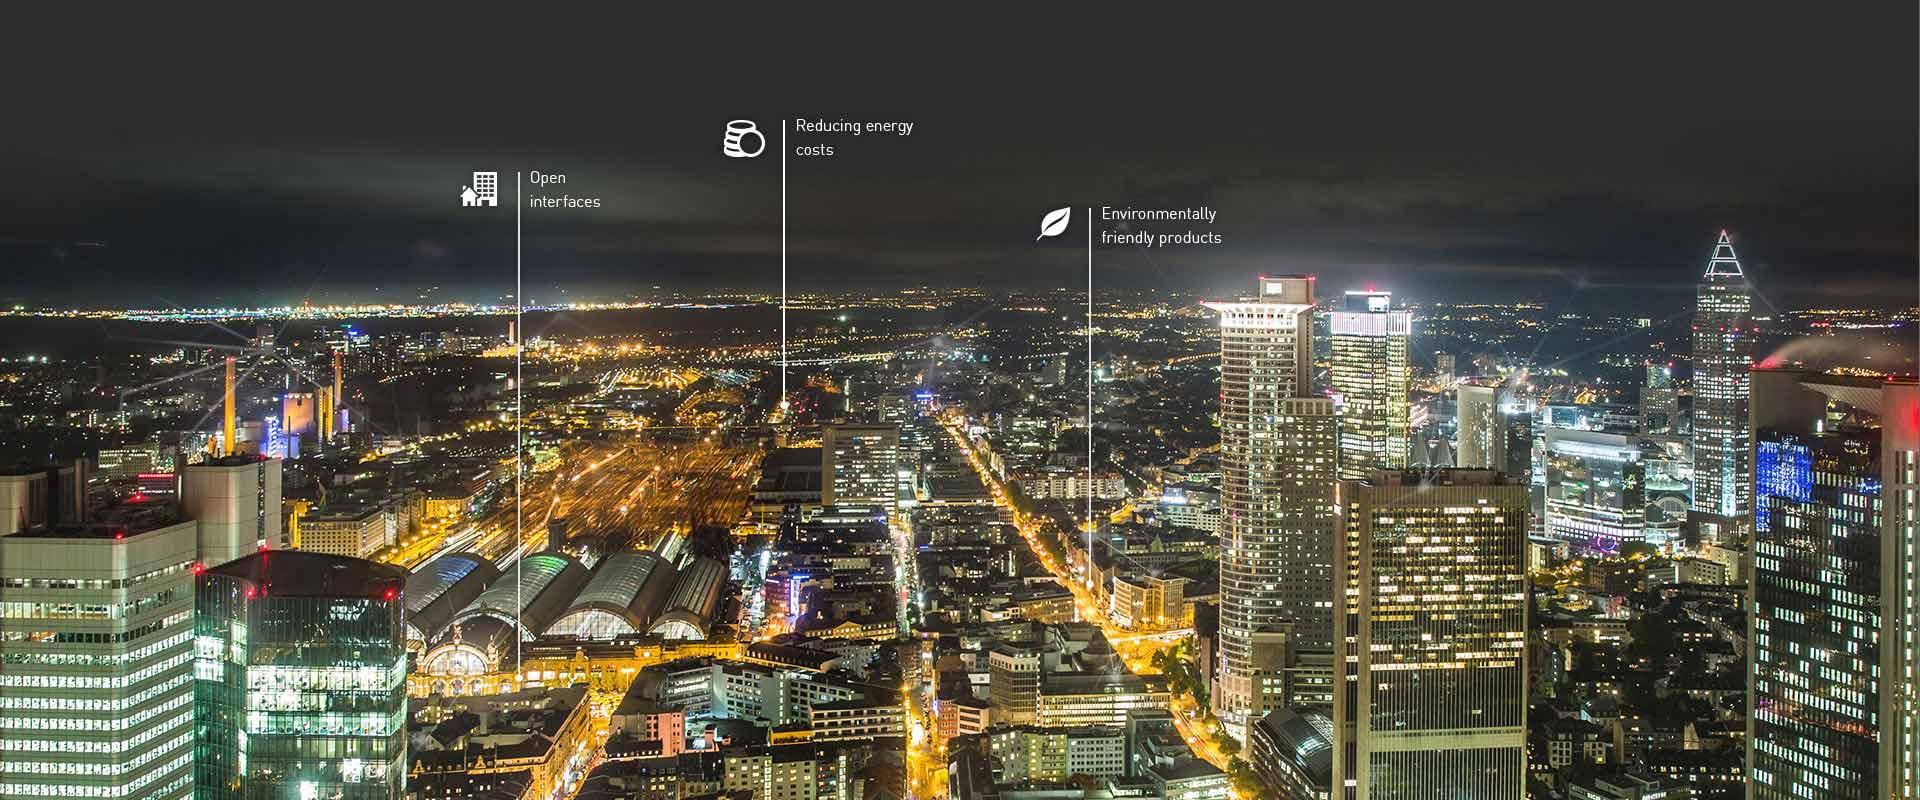 Smart City - Smart City - Outdoor - Applications